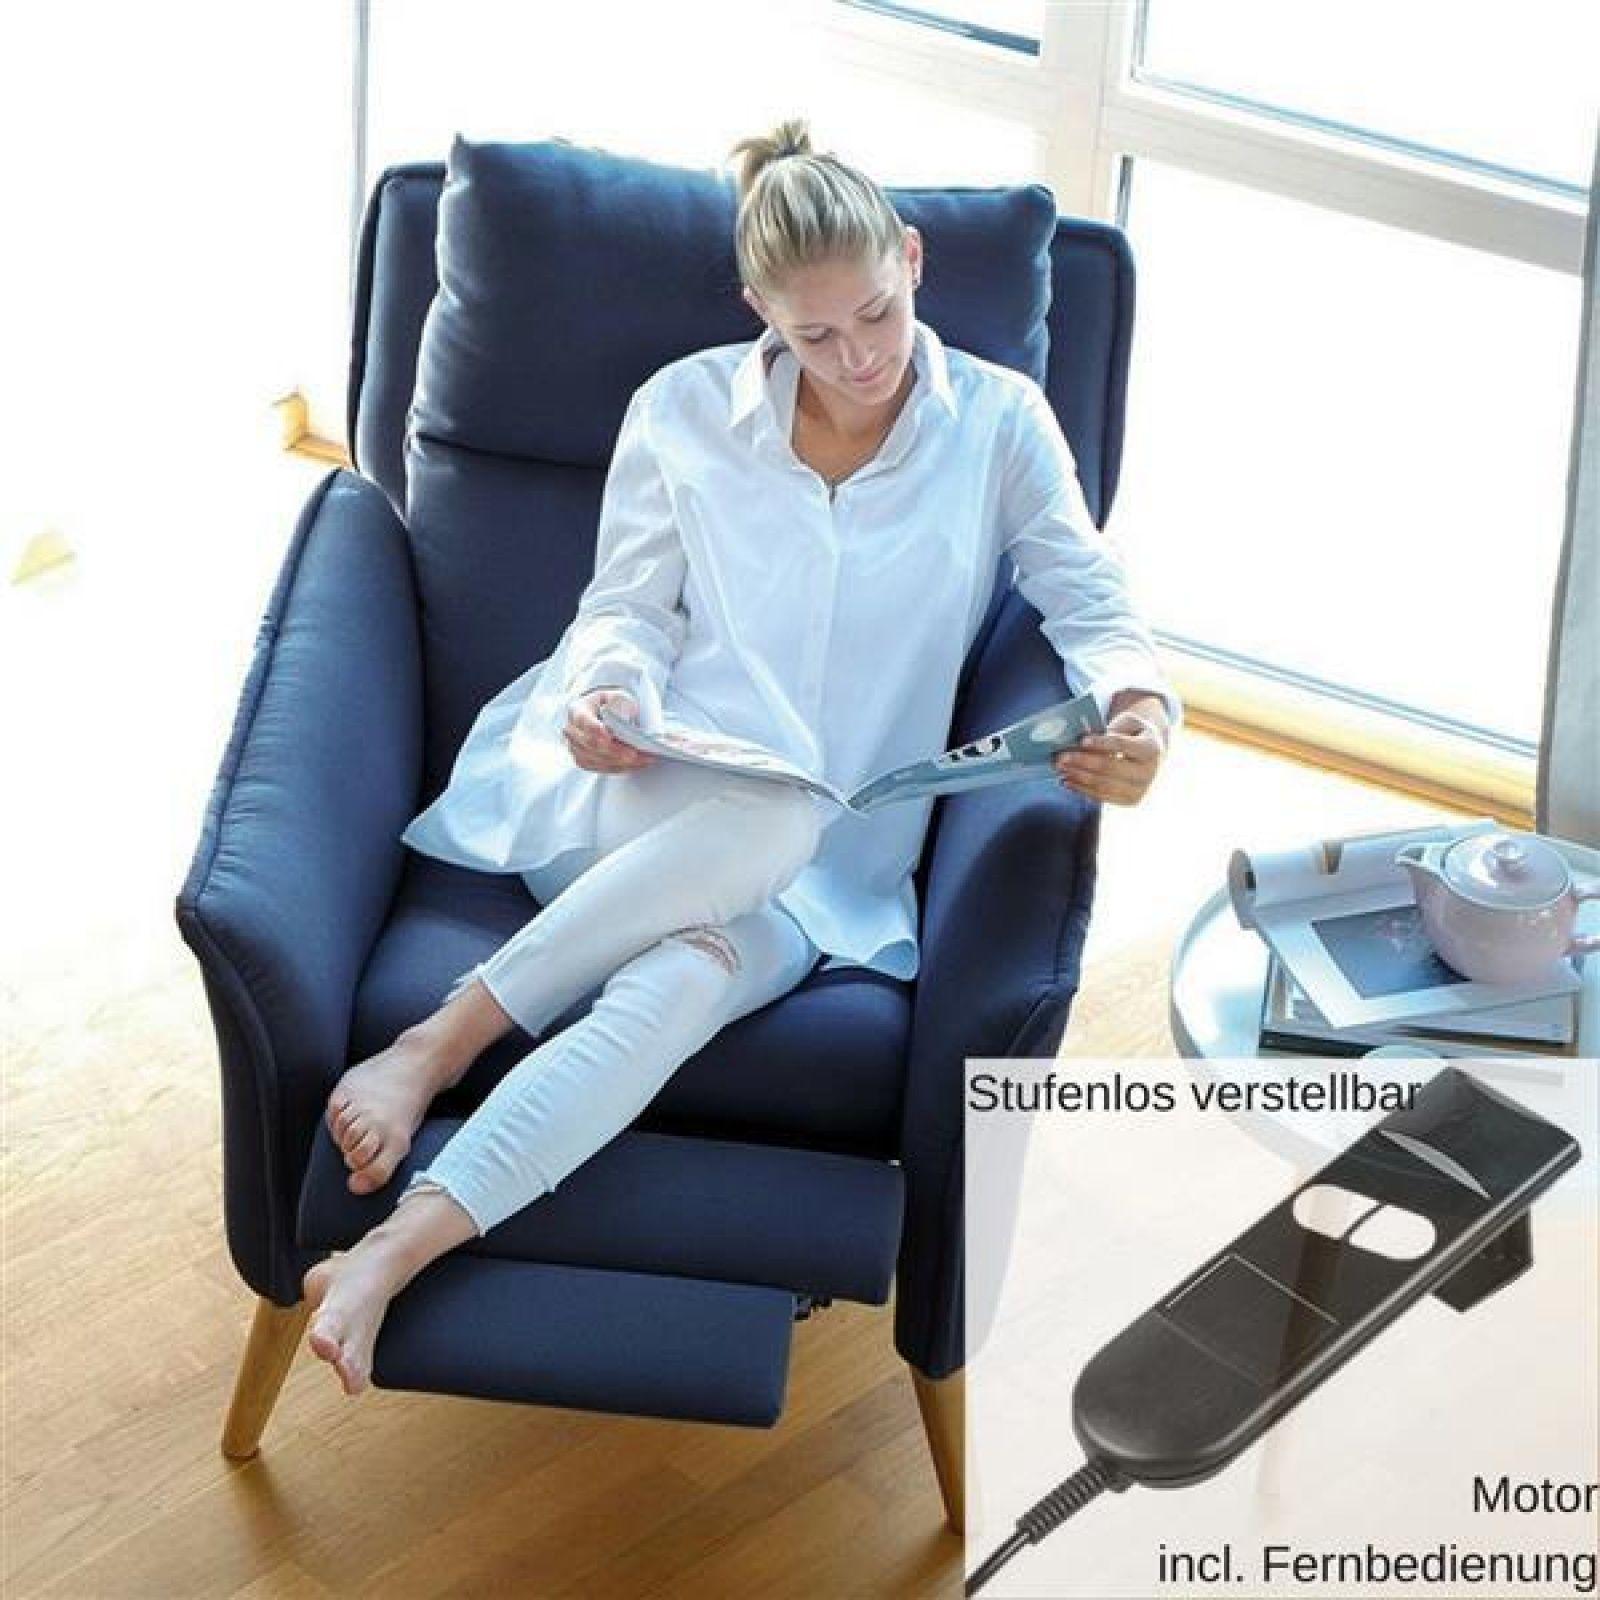 Motorischer Relaxsessel Ruhesessel Funktionssessel Insideout Mit Fernbedienung Relaxsessel Sessel Fernsehsessel